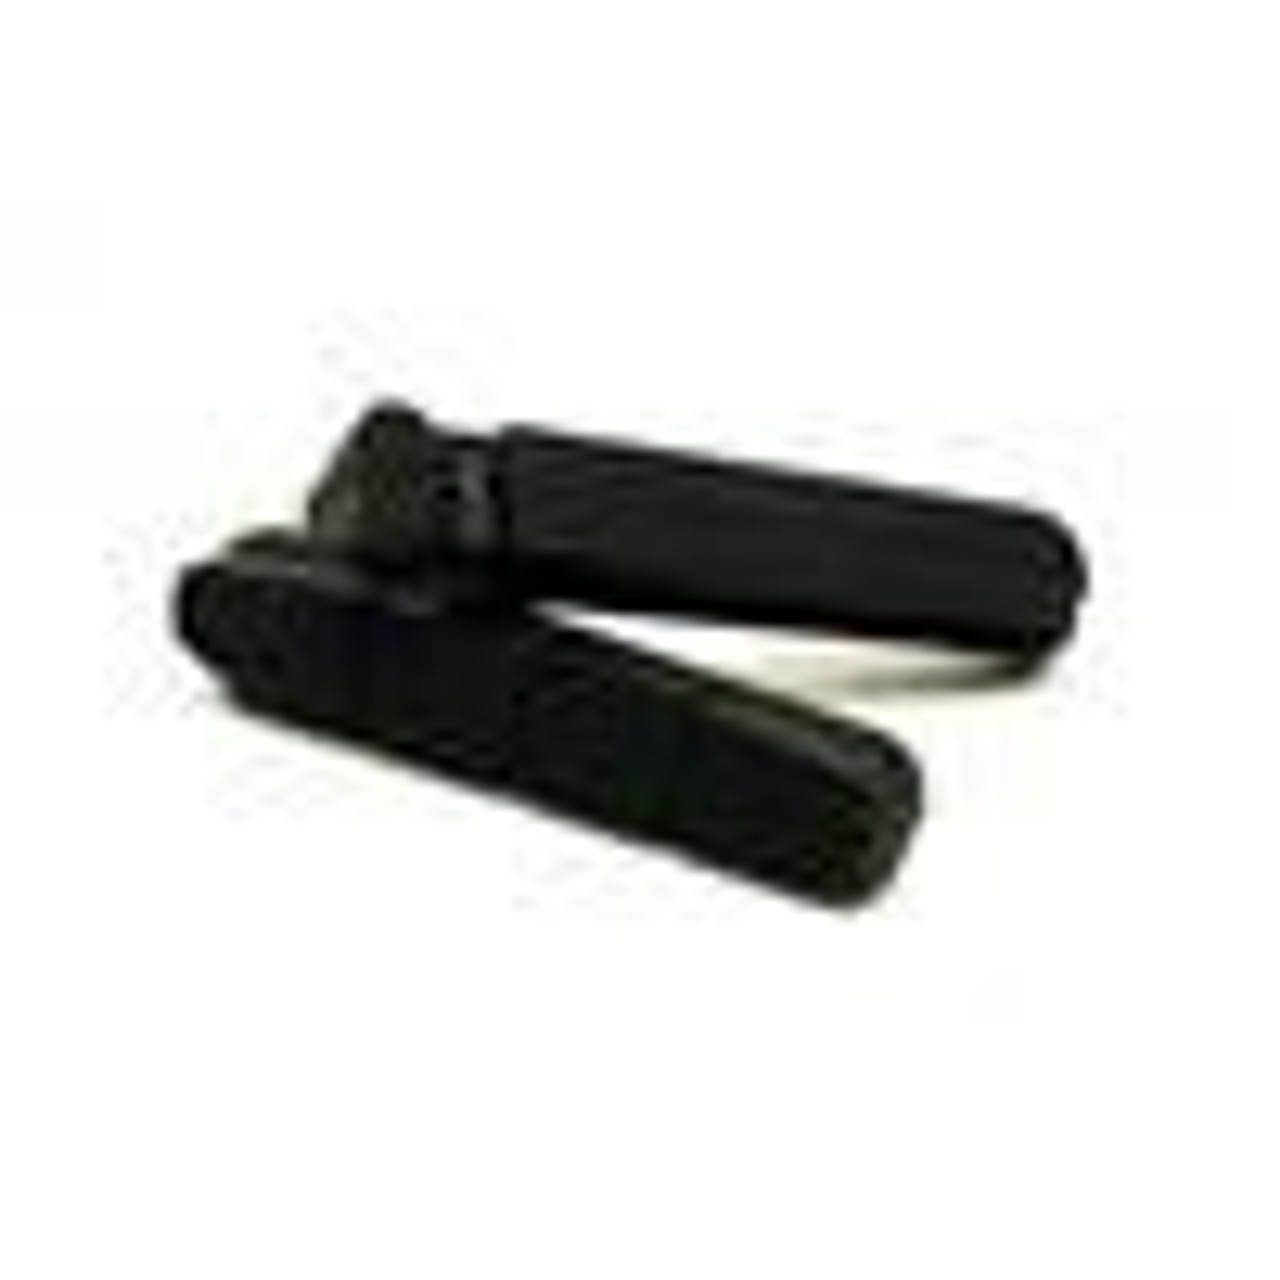 Shimano 7800 Dura Ace/Ultegra/105 Brake Pad for Carbon Rims